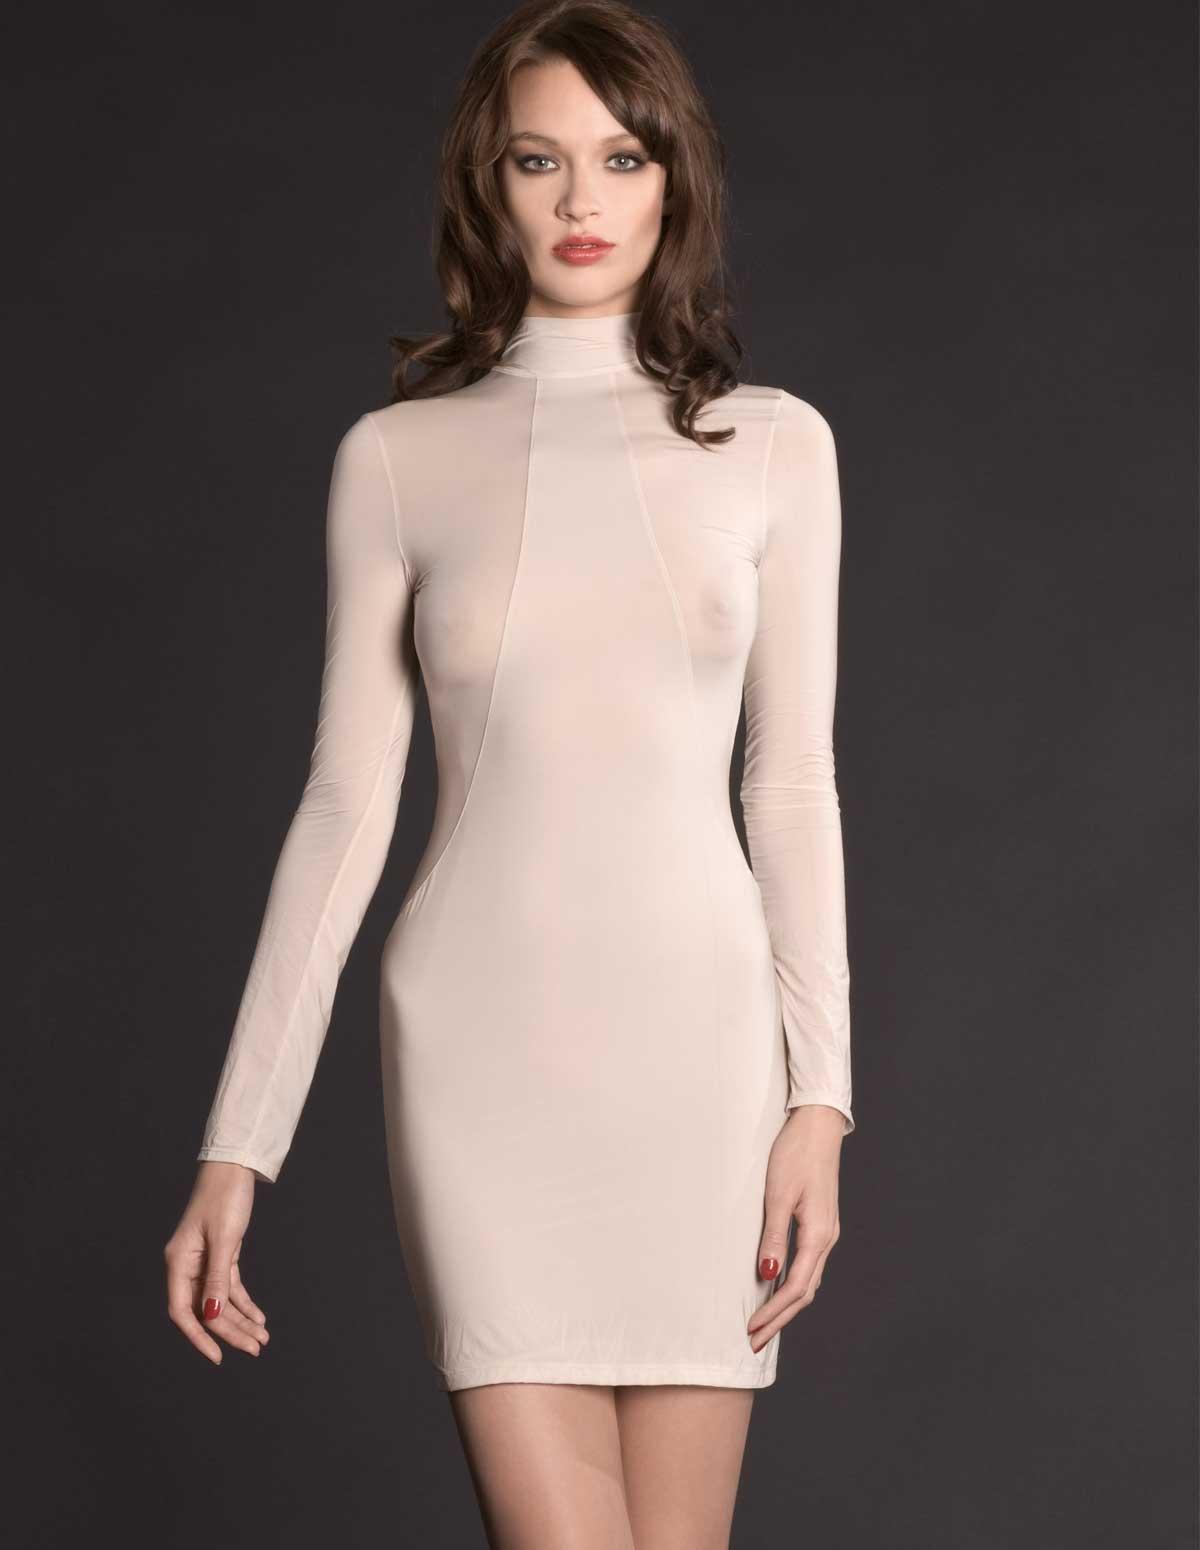 Basic Instinct Dress